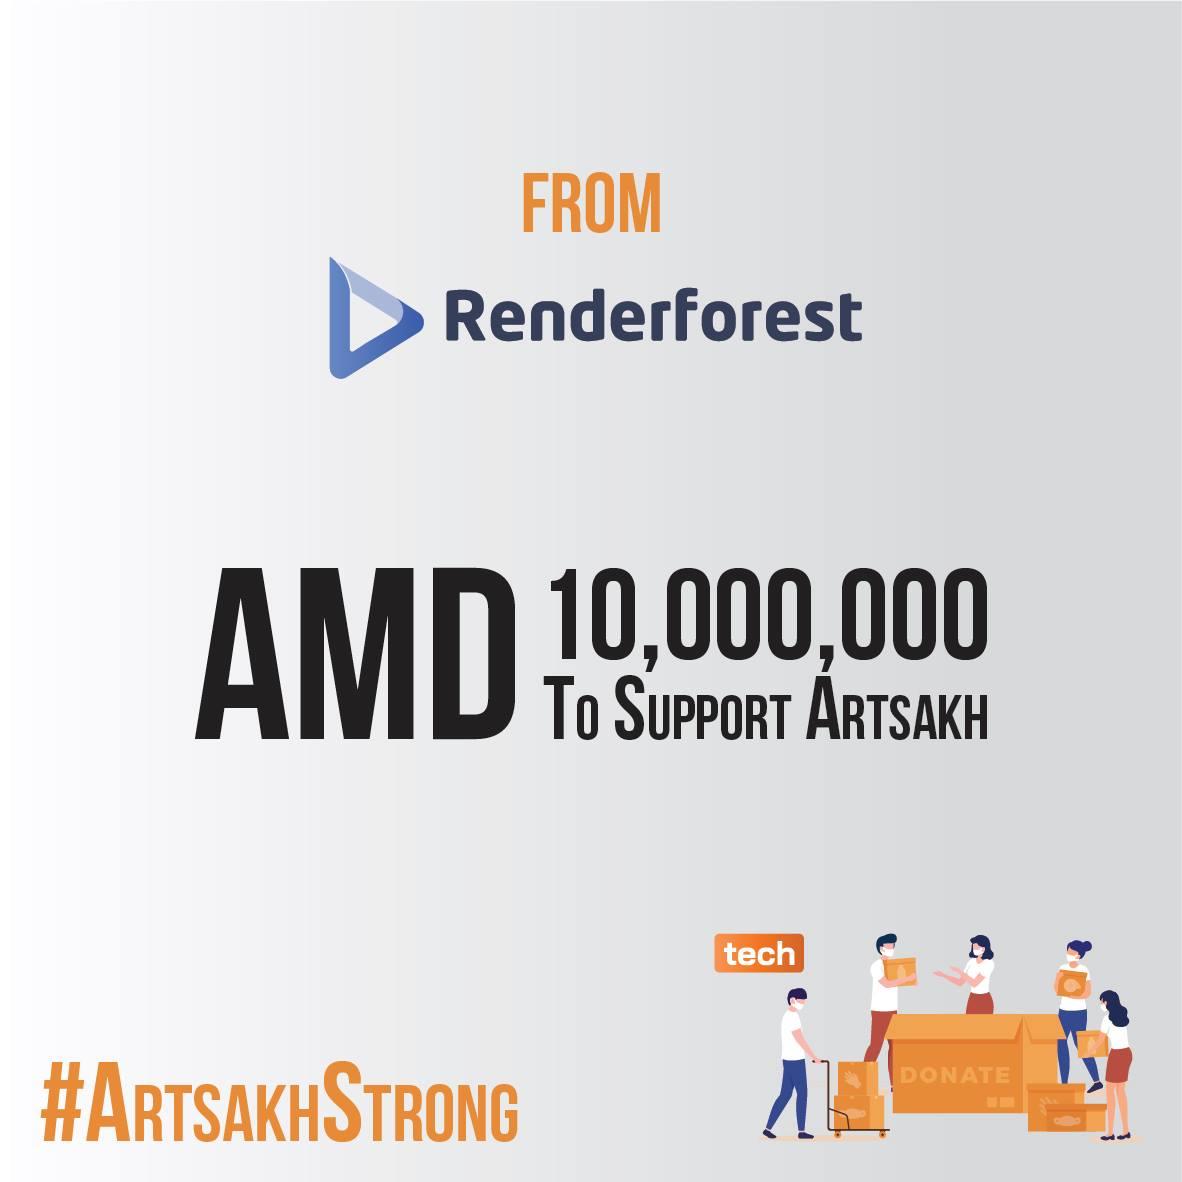 Renderforest-ը 10 միլիոն դրամ է փոխանցել Արցախի ֆինանսների նախարարությանը